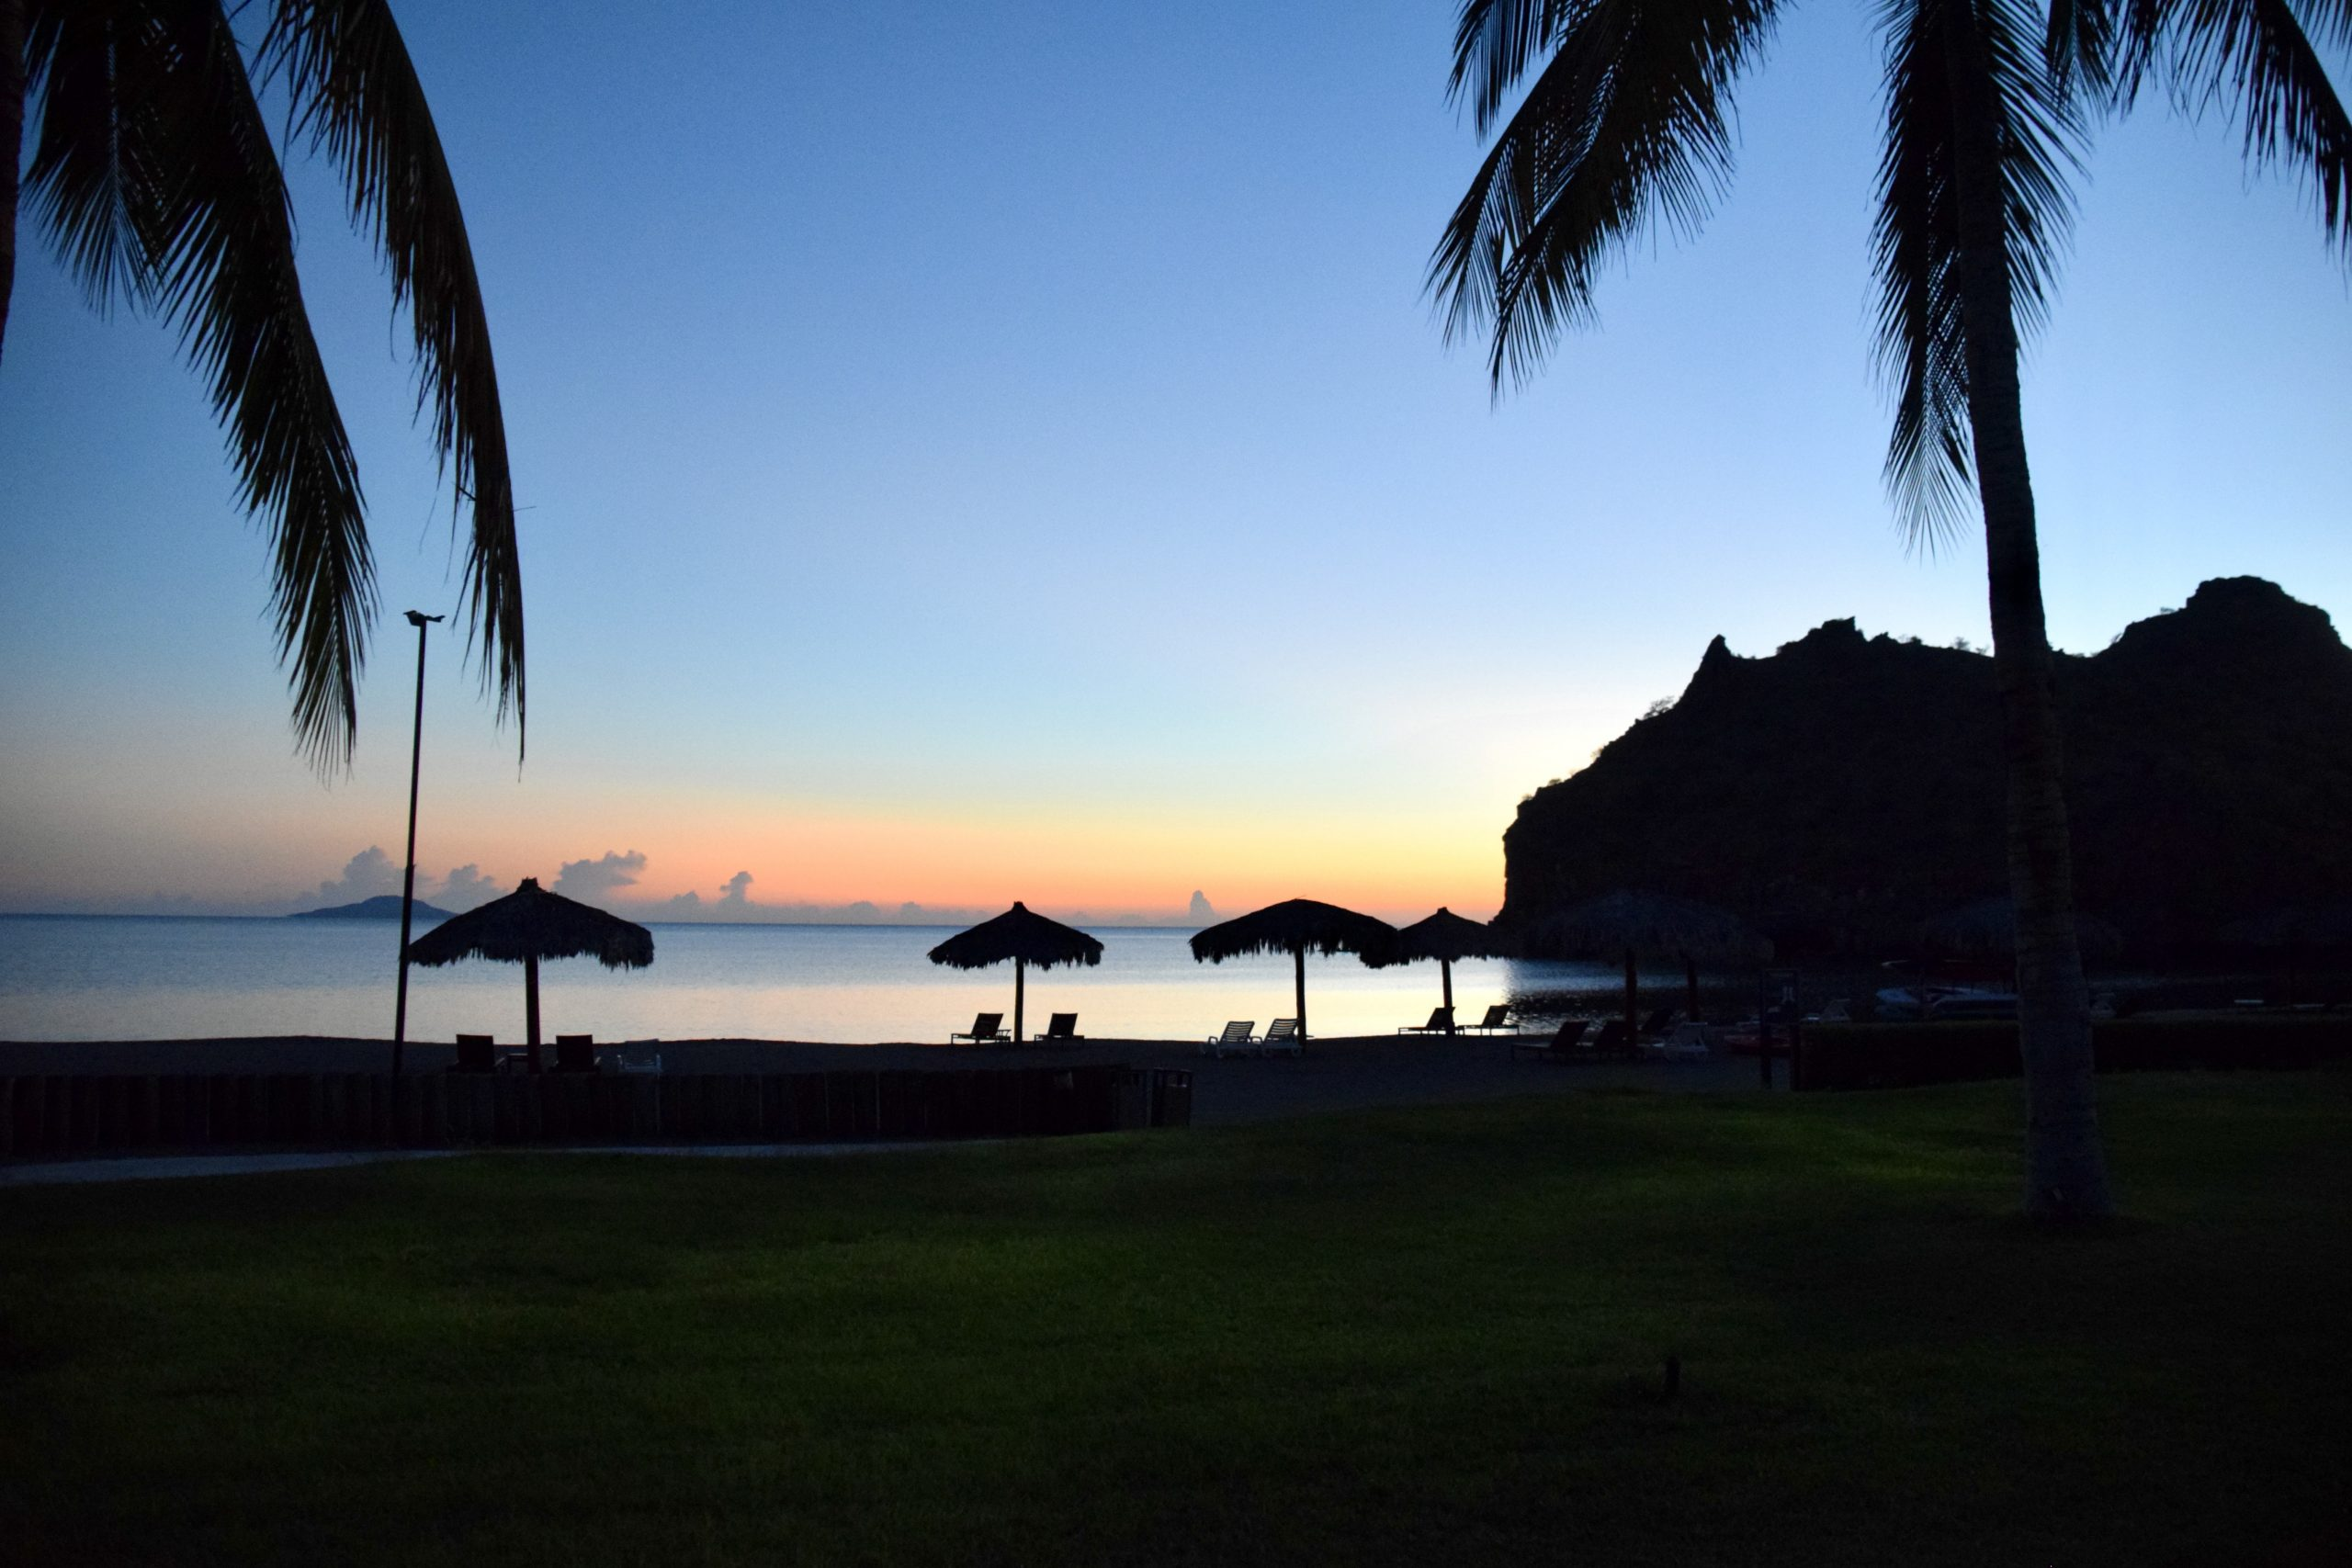 sunrise with beach palapas along the coast of Loreto, Mexico